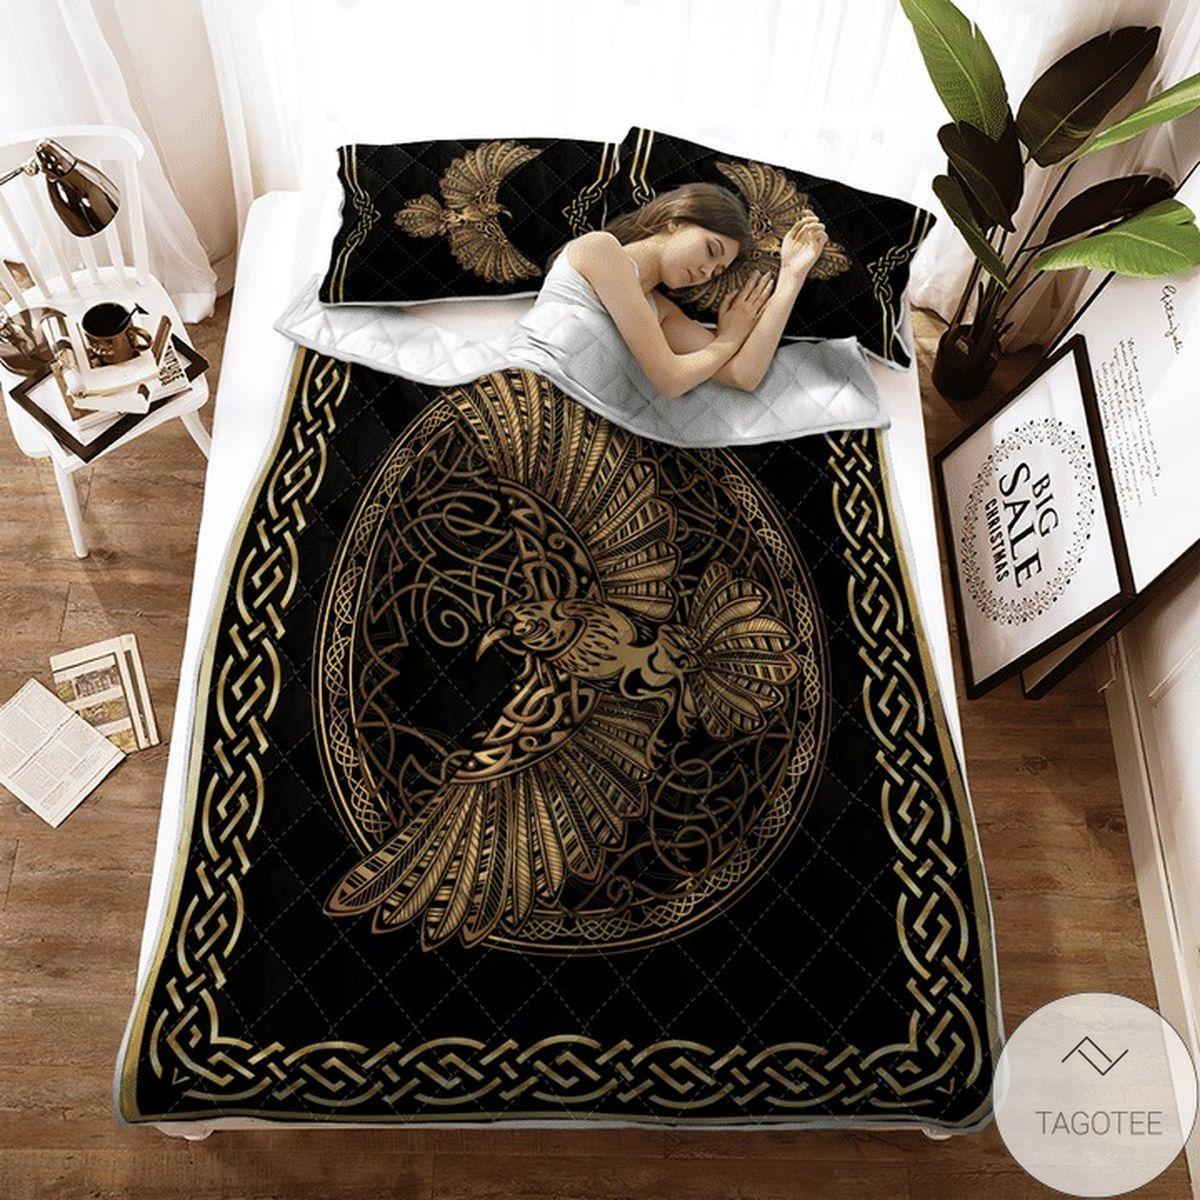 Odin's Celtic Raven On The Background Yggdrasil Tree Viking Quilt Bedding Set x